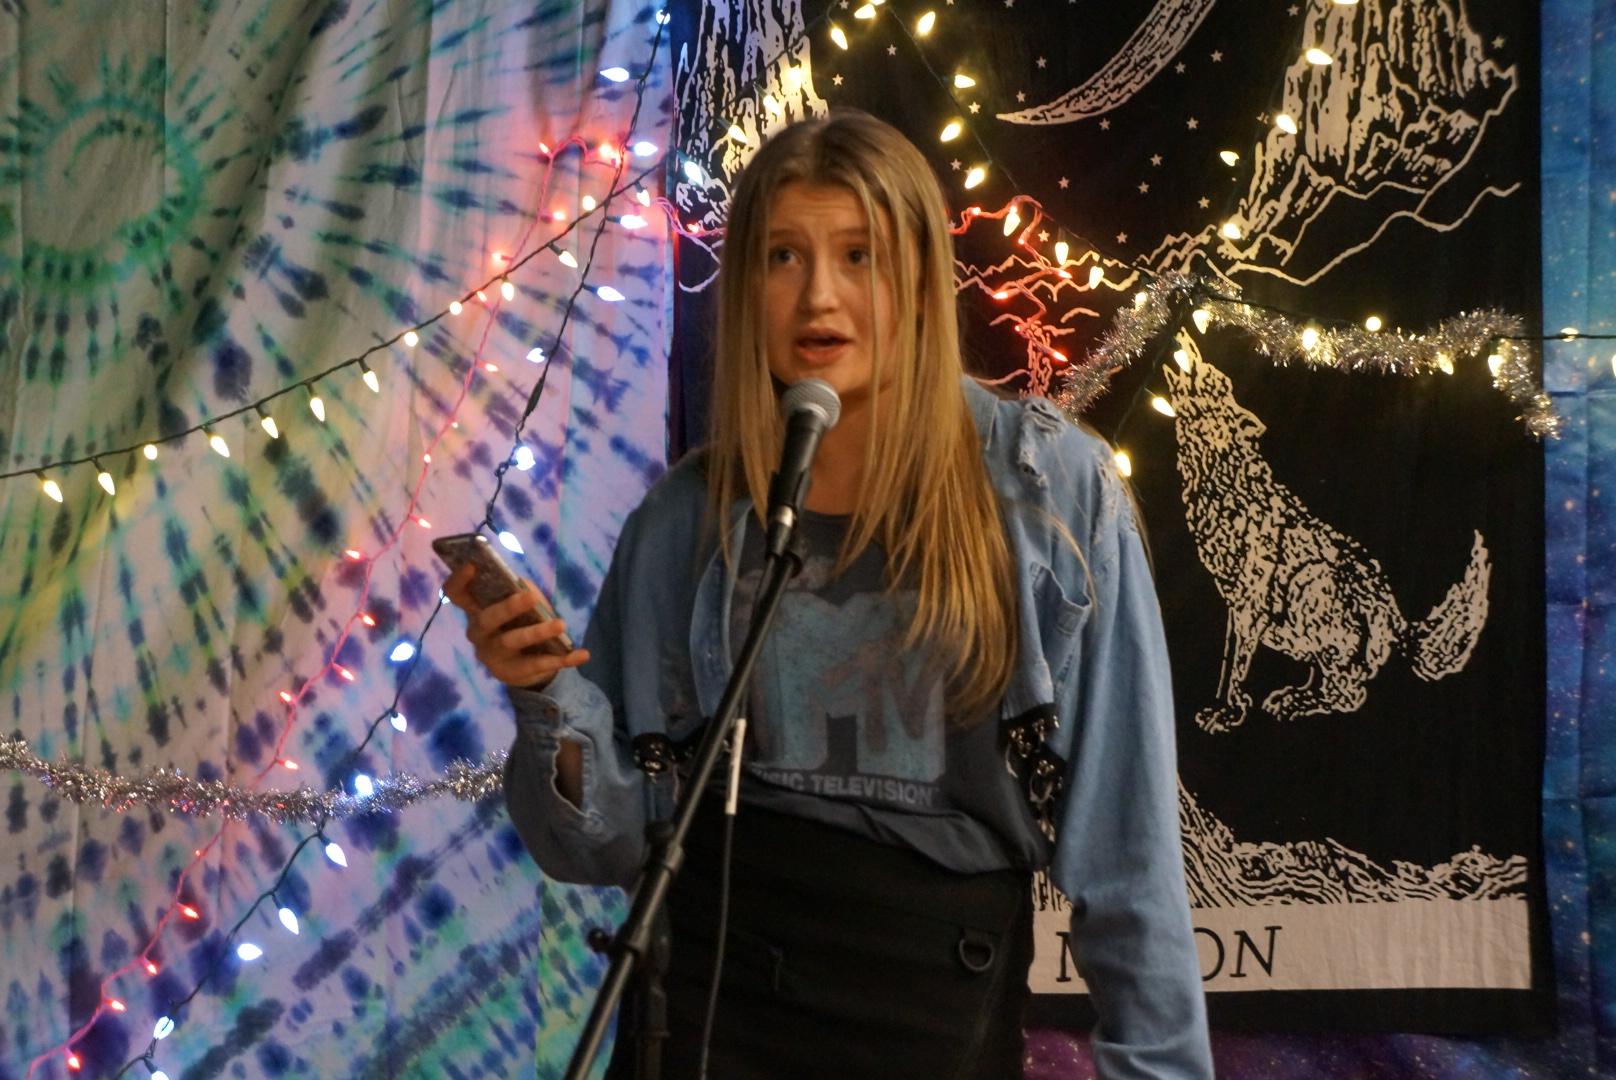 Devin Overend performed a spoken word poem at the event.